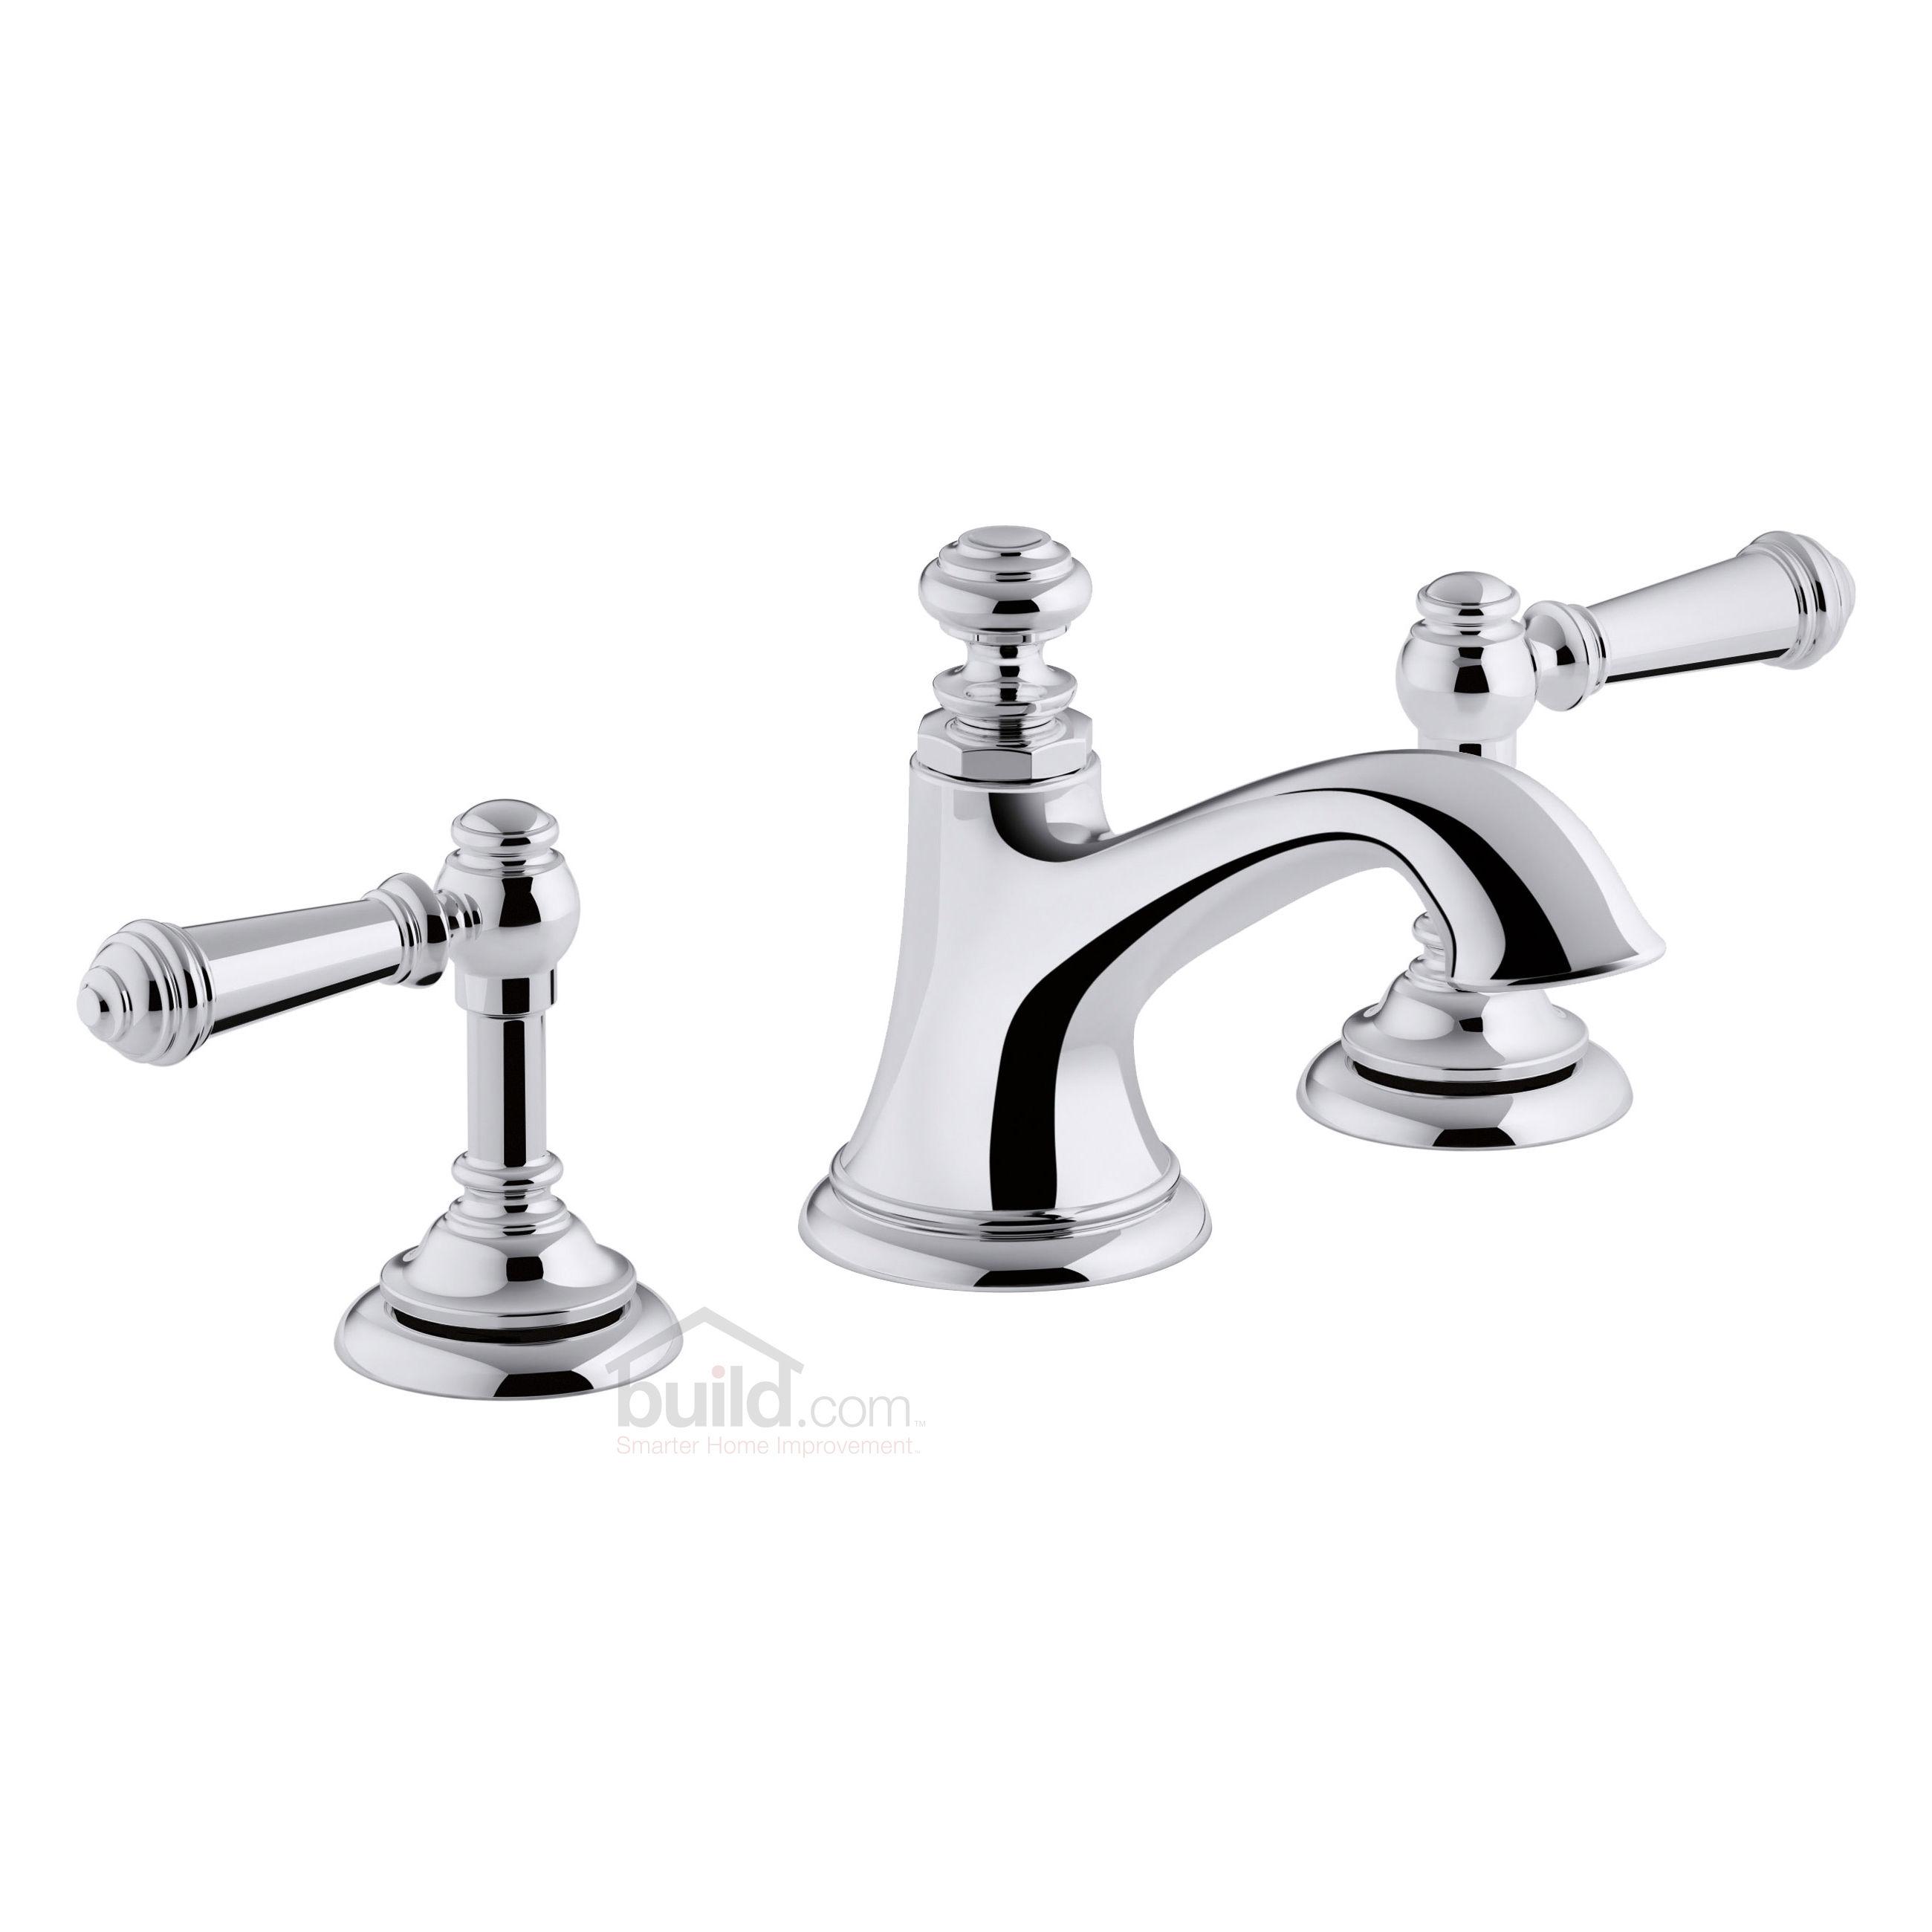 Kohler K-72759-4-CP Polished Chrome Artifacts Widespread Bathroom ...